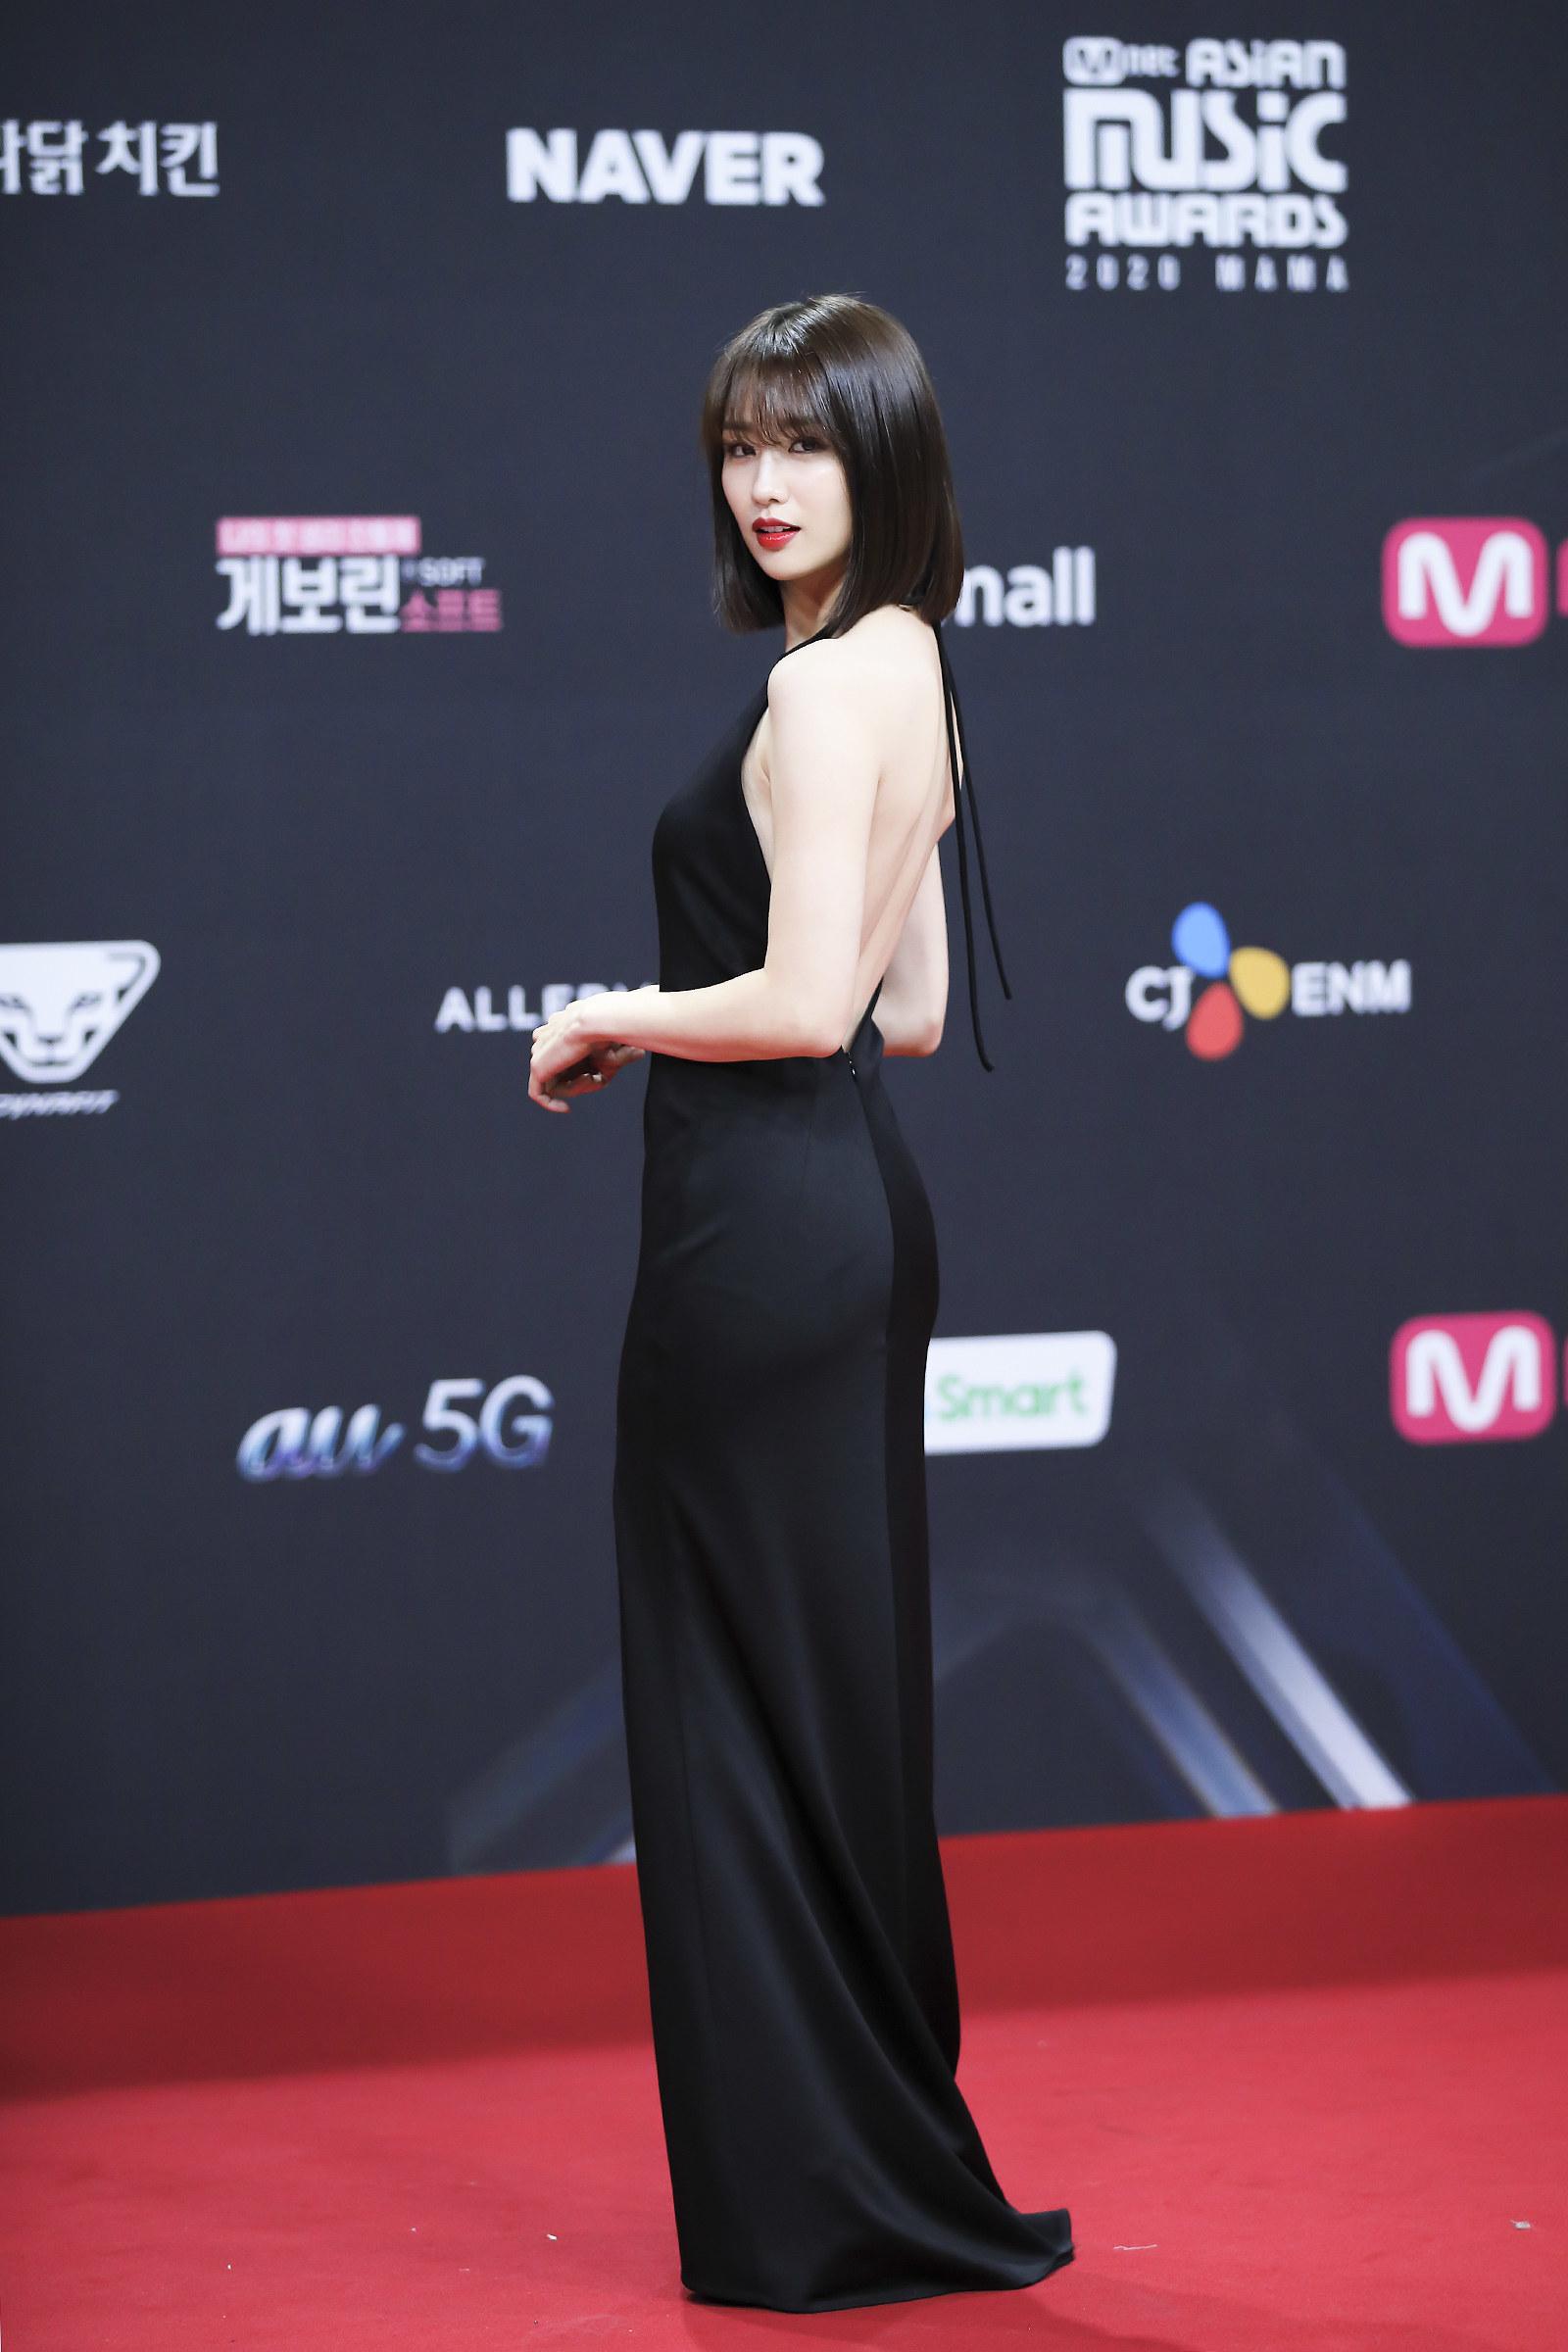 Park Ha Sun wears a black floor-length gown at the 2020 Mnet Asian Music Awards